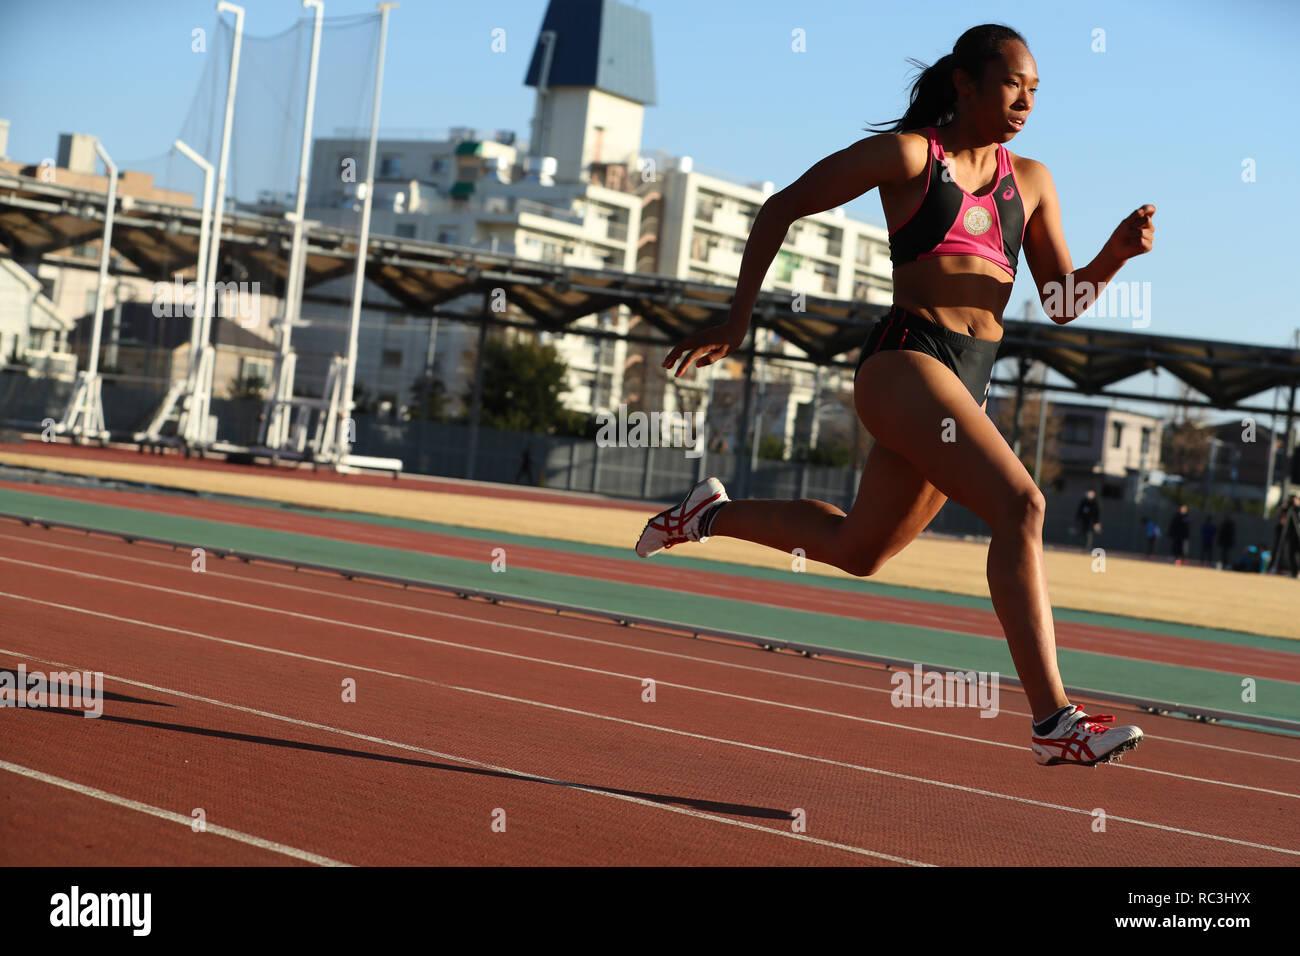 JANUARY 13, 2019 - Athletics : JAAF women's relay sprinter selection at Ajinomoto national training cener athletis field in Tokyo, Japan. Credit: Yohei Osada/AFLO SPORT/Alamy Live News - Stock Image